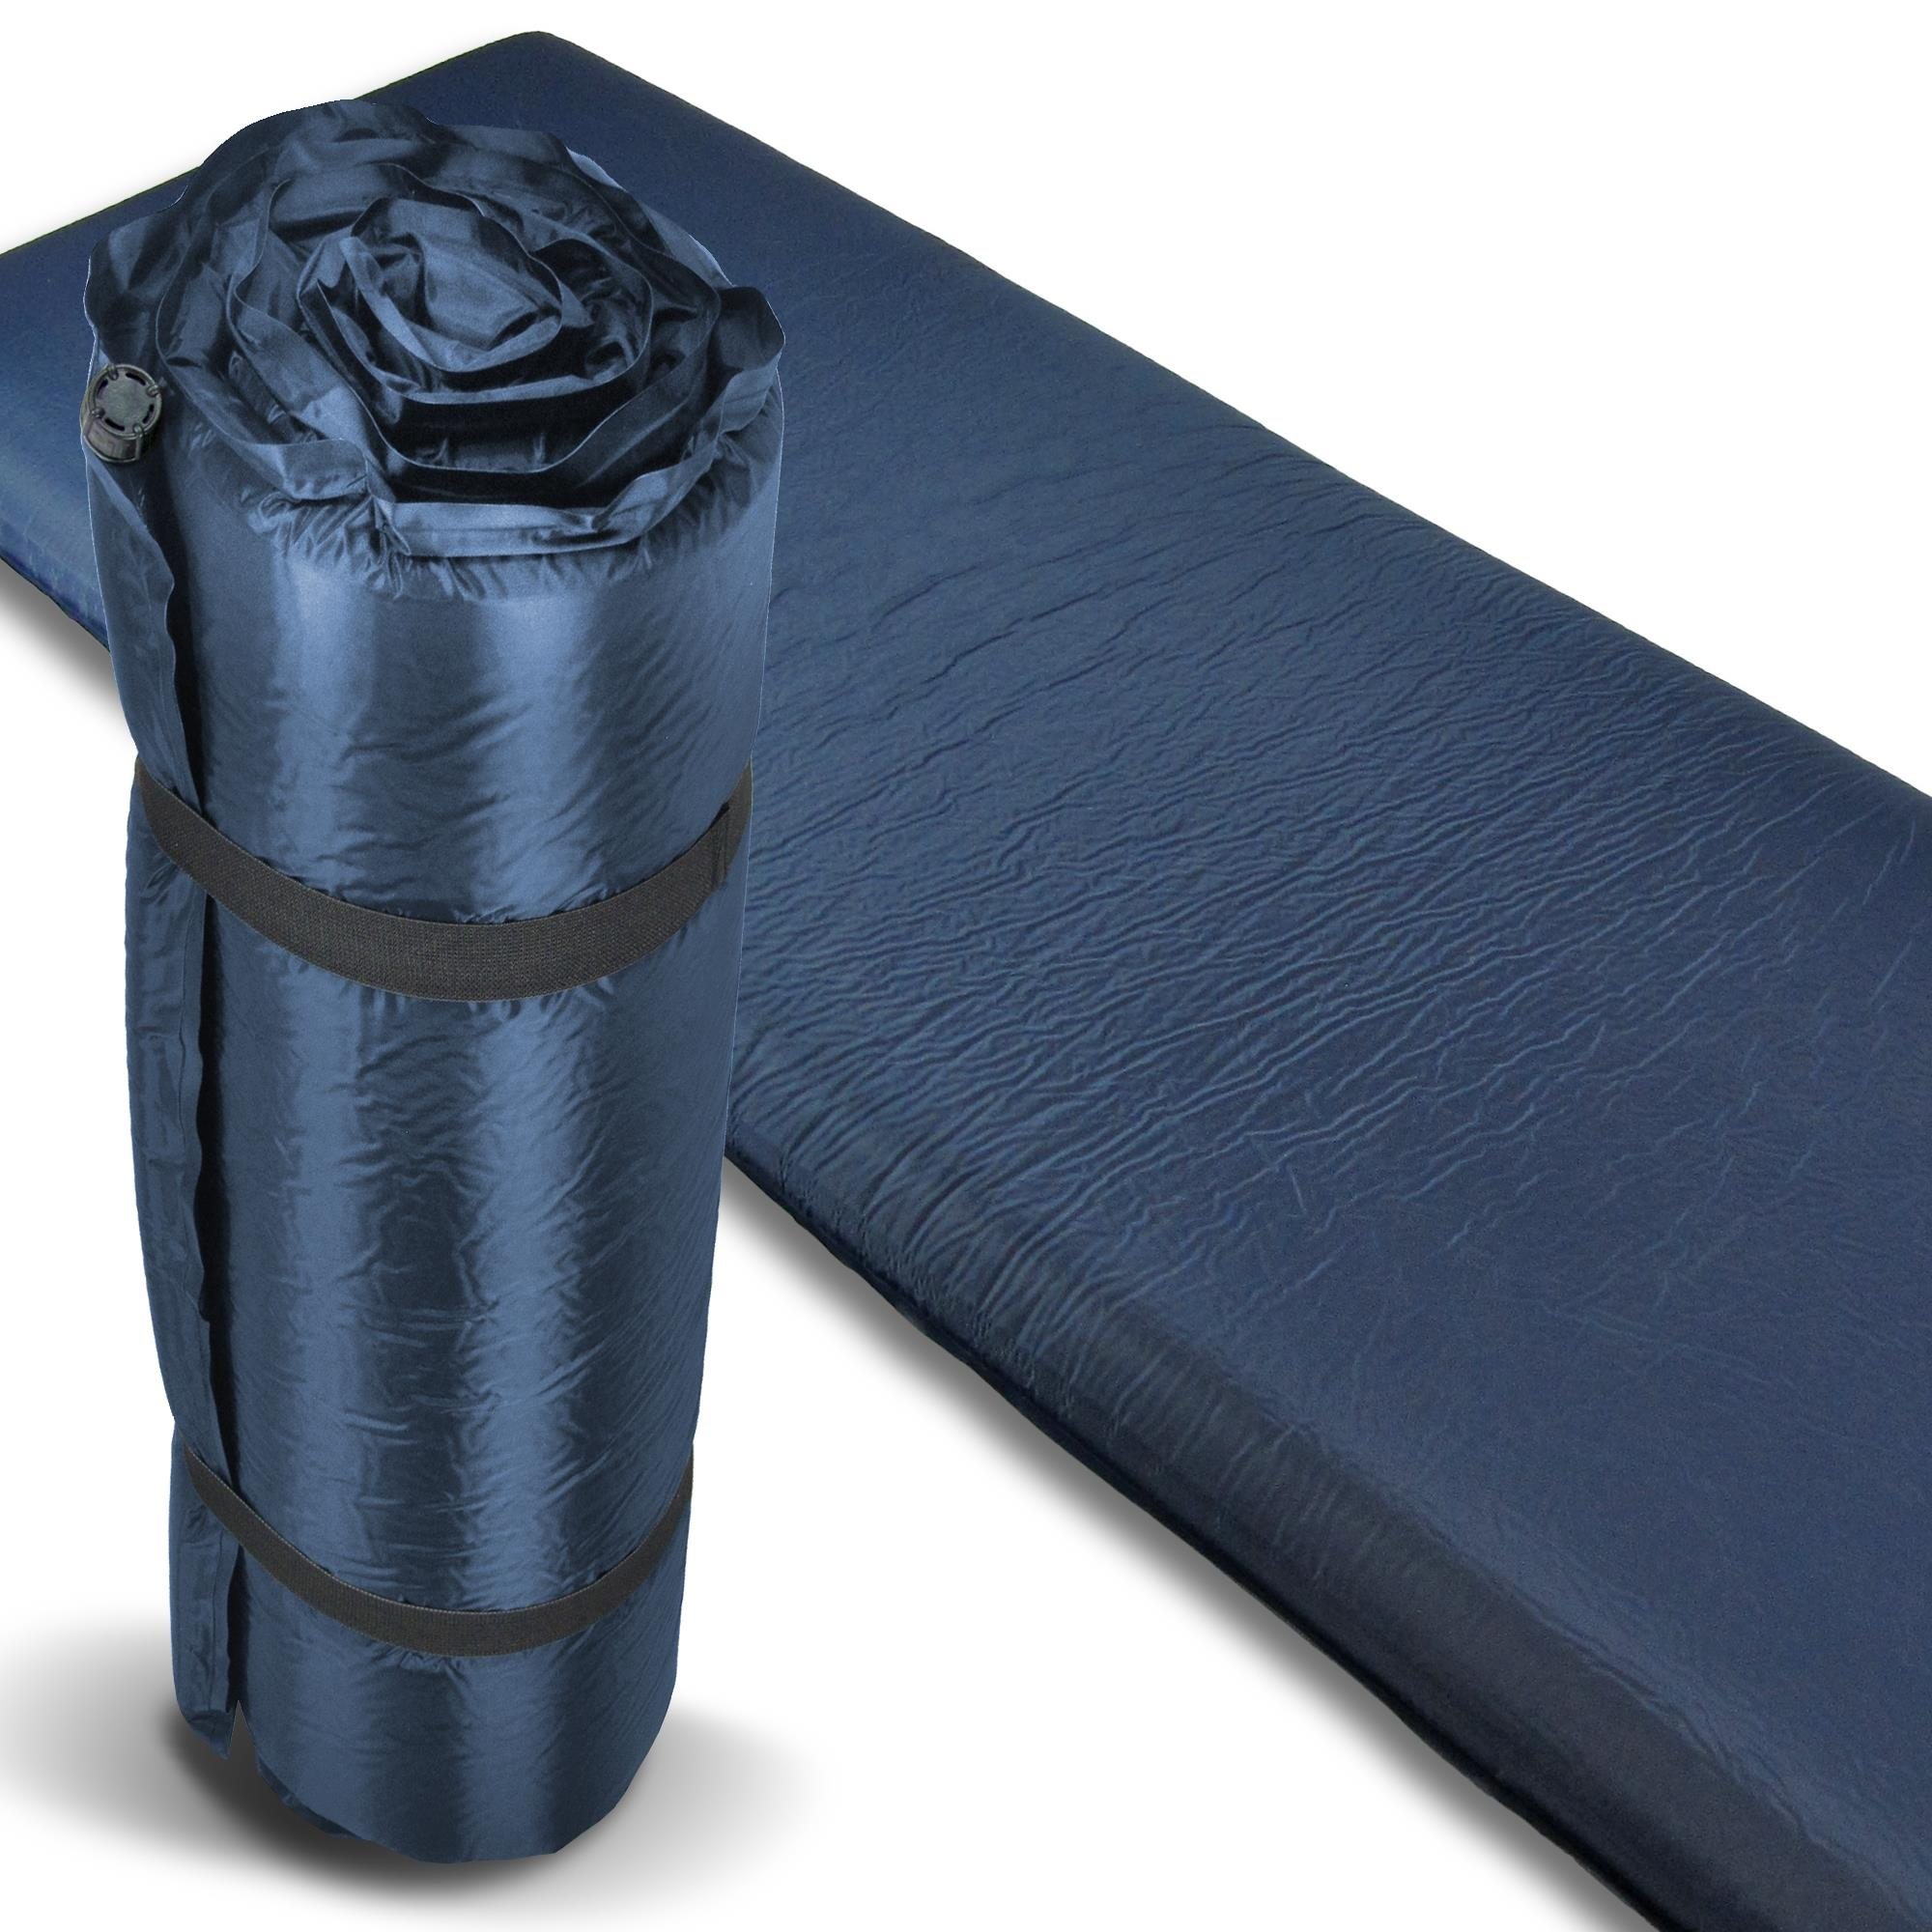 xxl isomatte thermo selbstaufblasend luftmatratze blau 10. Black Bedroom Furniture Sets. Home Design Ideas